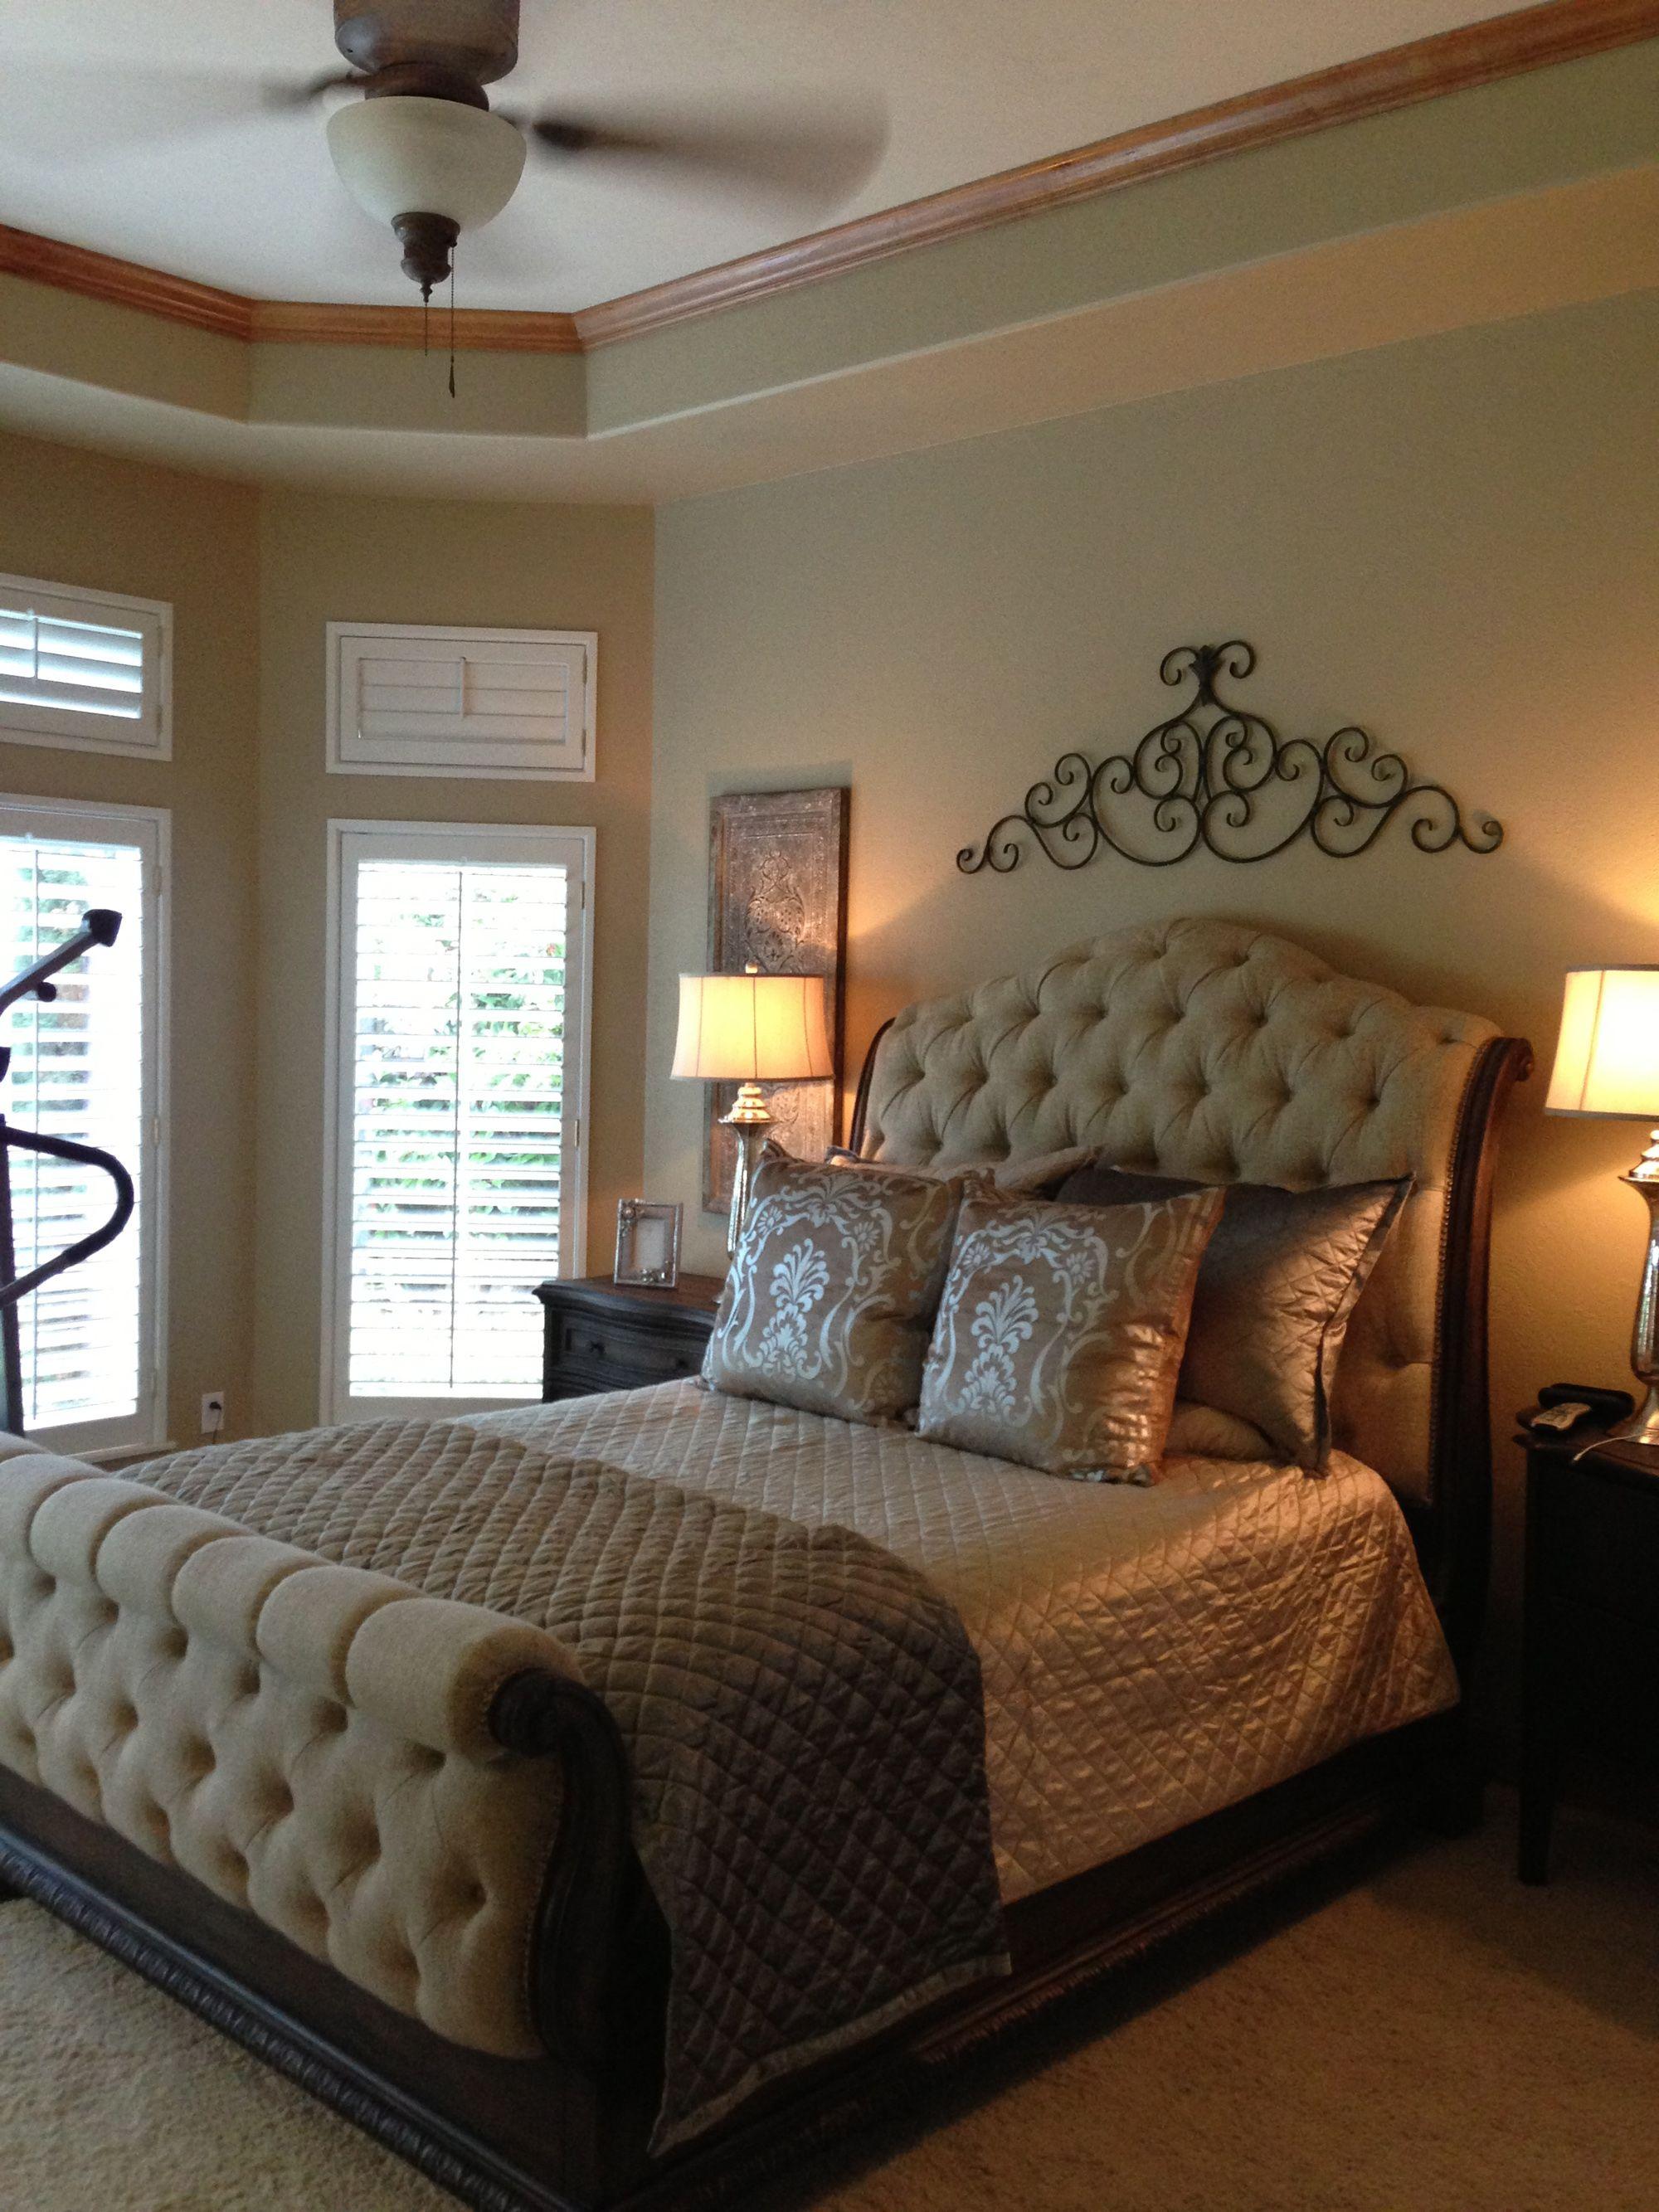 Elegant | Remodel bedroom, Master bedrooms decor